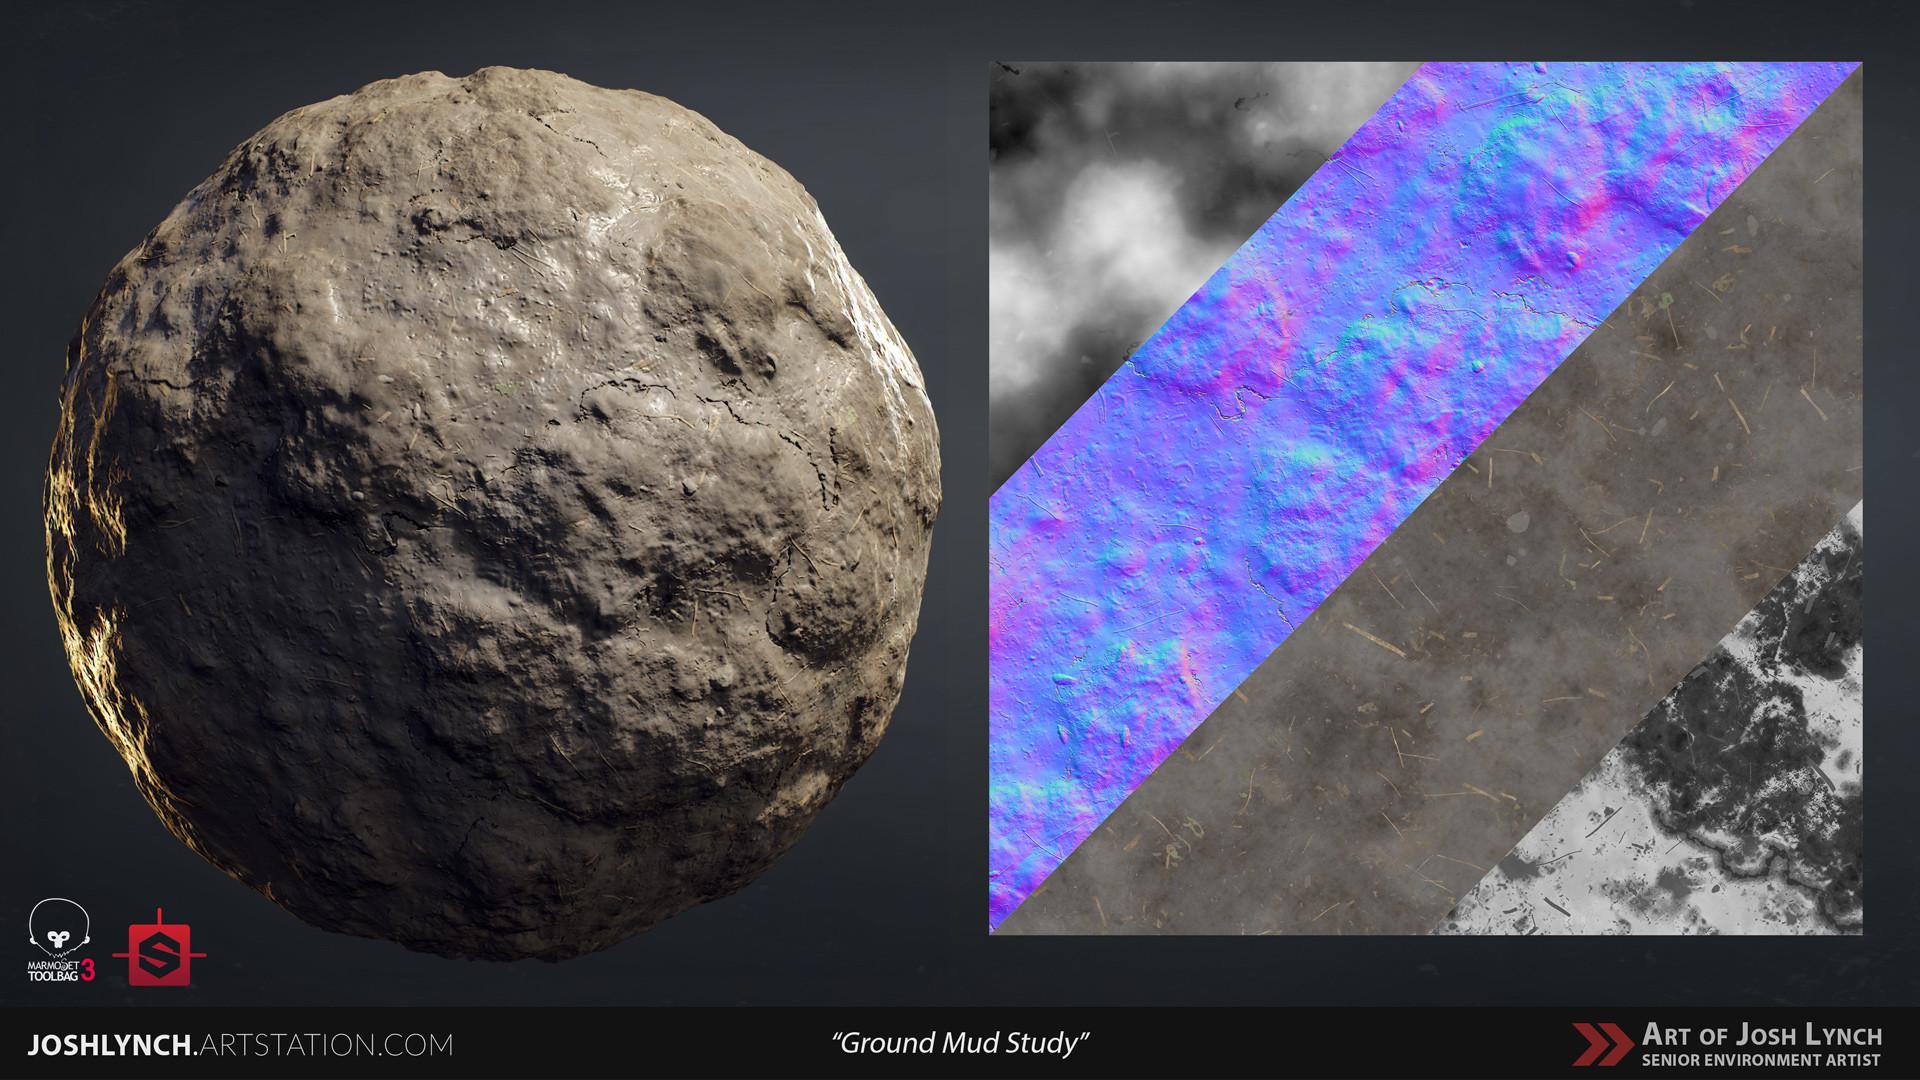 Joshua lynch ground mud 01 sphere 01